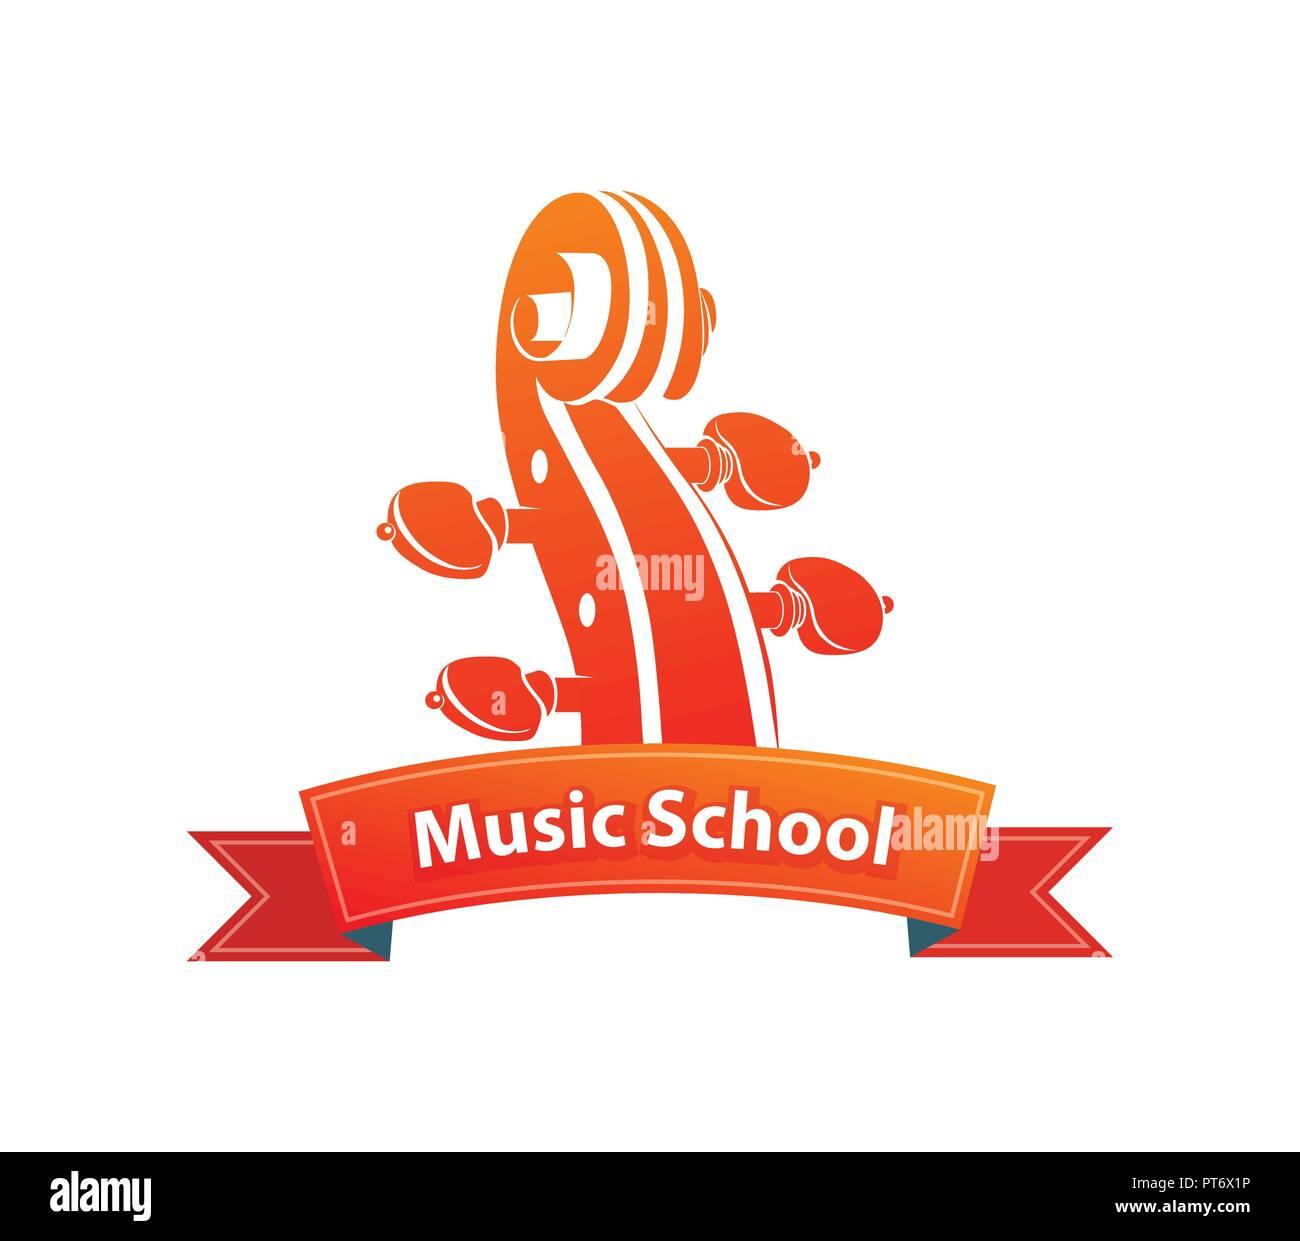 Logo Emblem for Music School - Stock Image